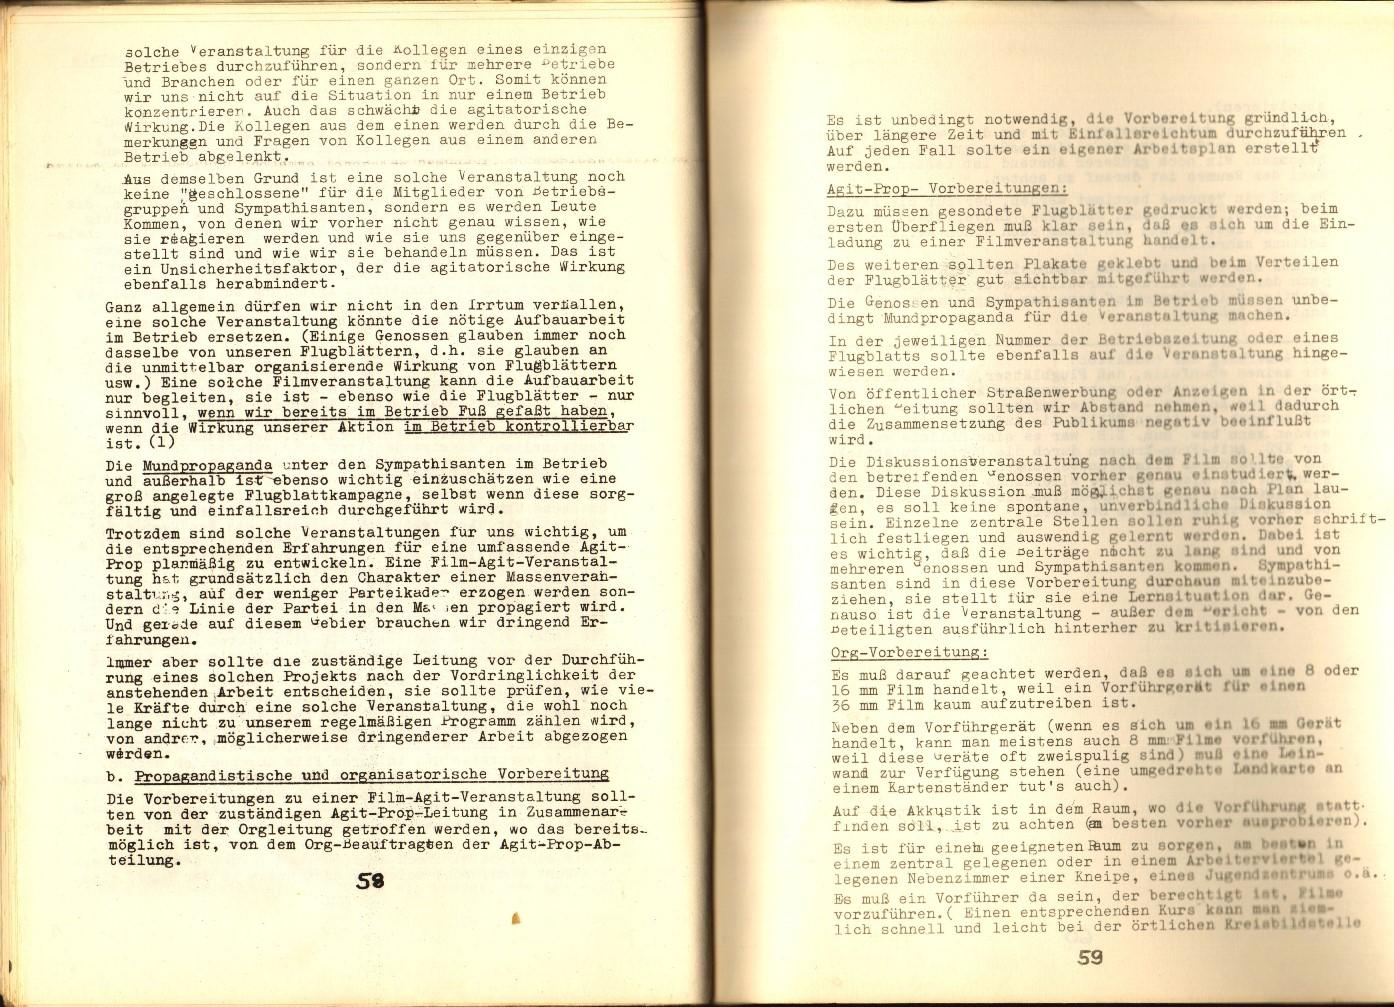 ZB_Parteiarbeiter_1970_03_37